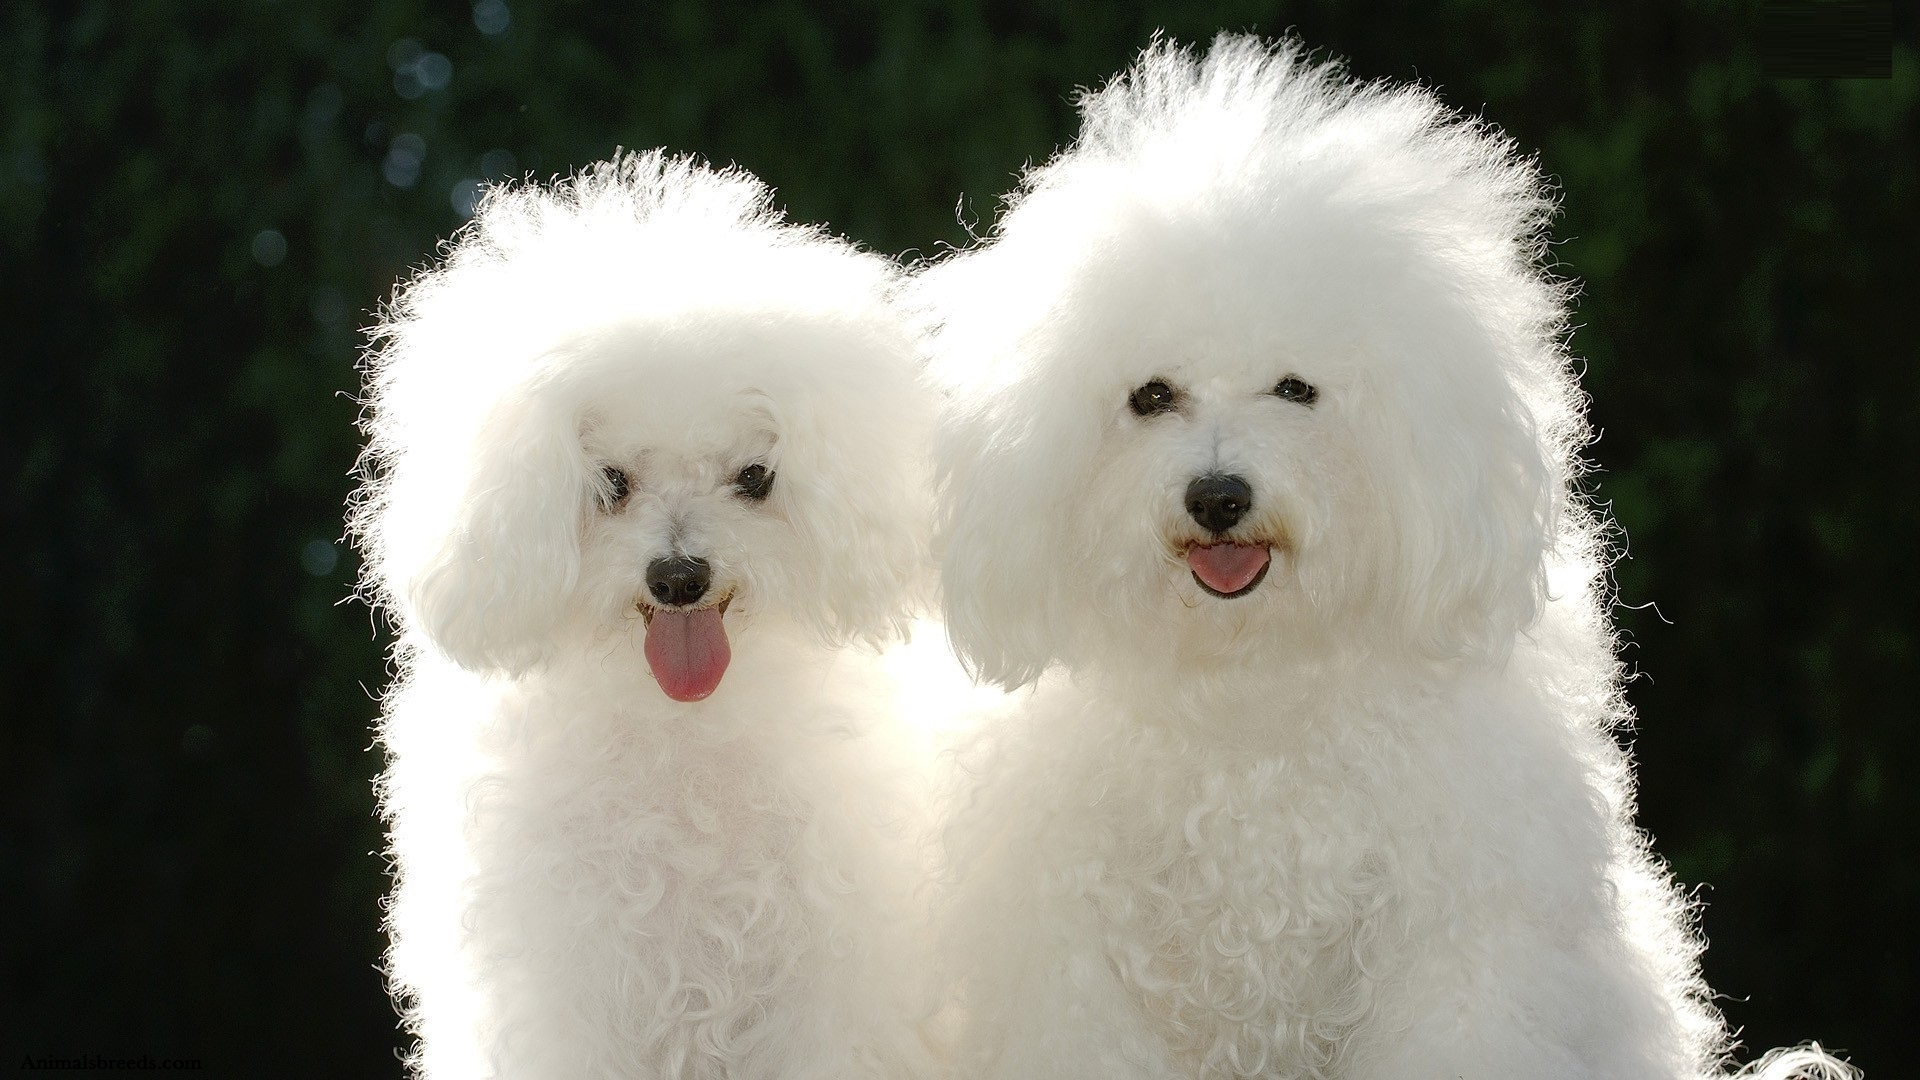 Cute Puppies Wallpaper 1080p Bichon Frise Puppies Rescue Pictures Information